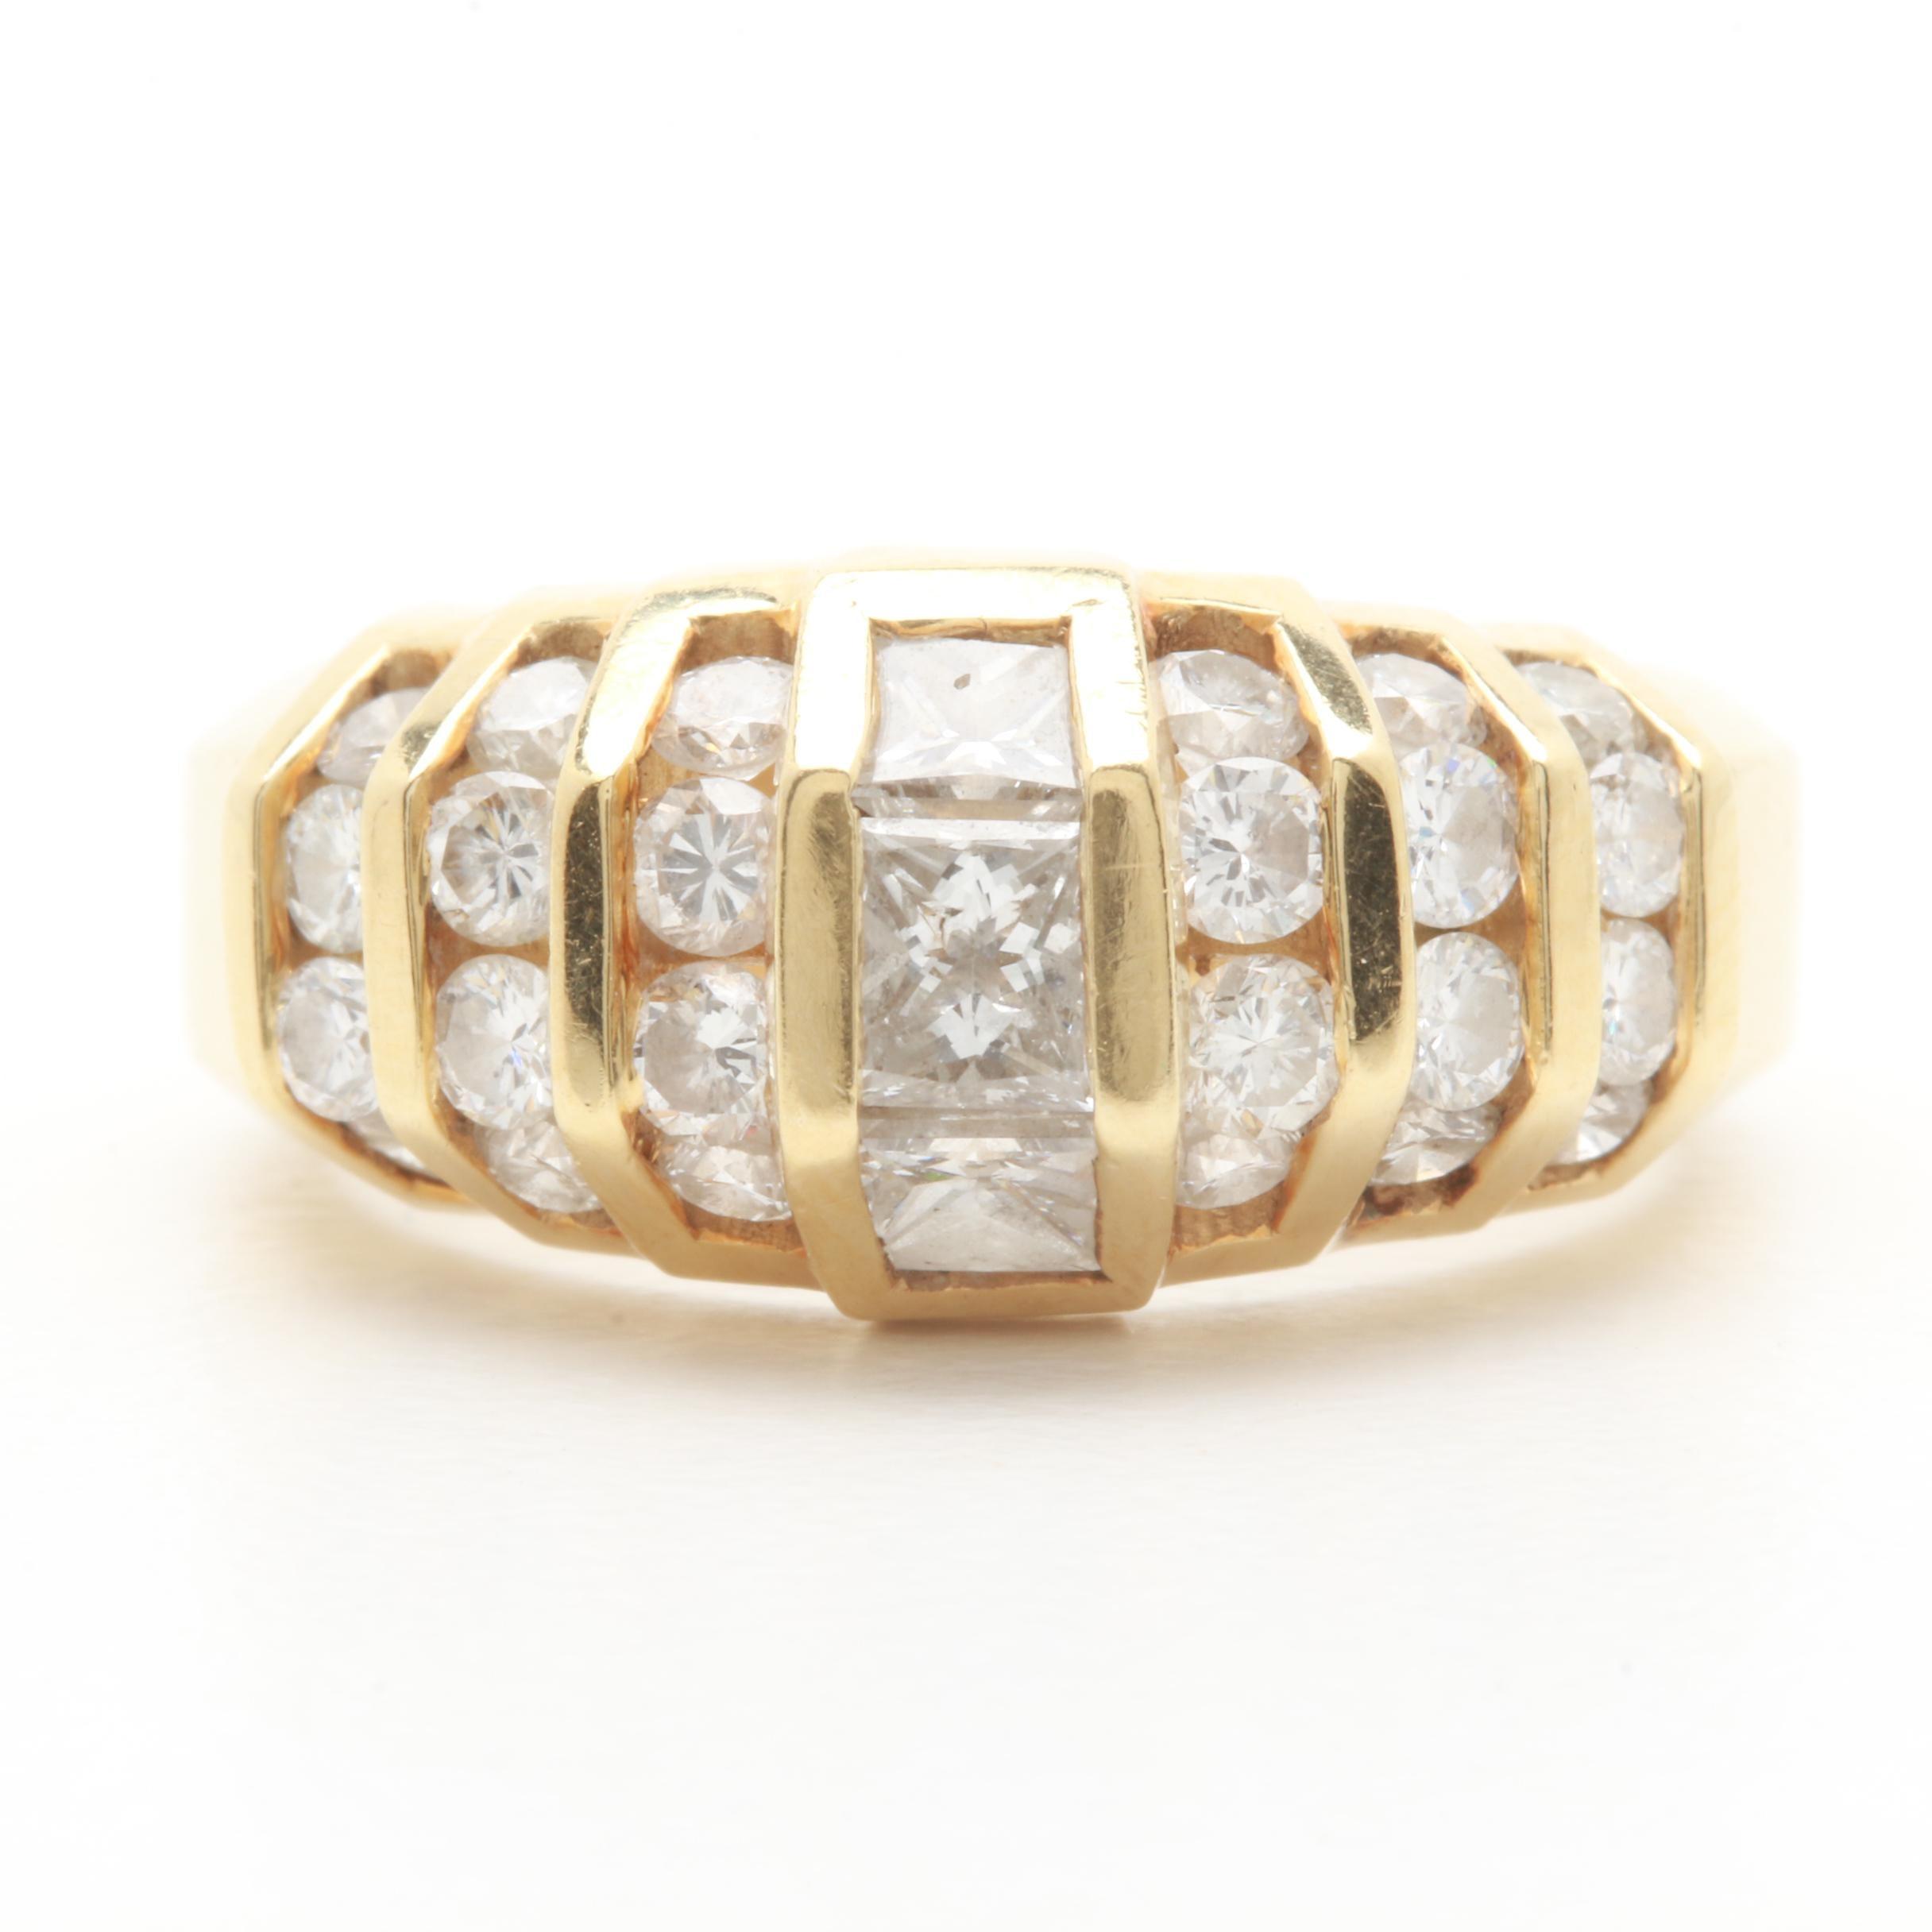 14K Yellow Gold 1.74 CTW Diamond Ring